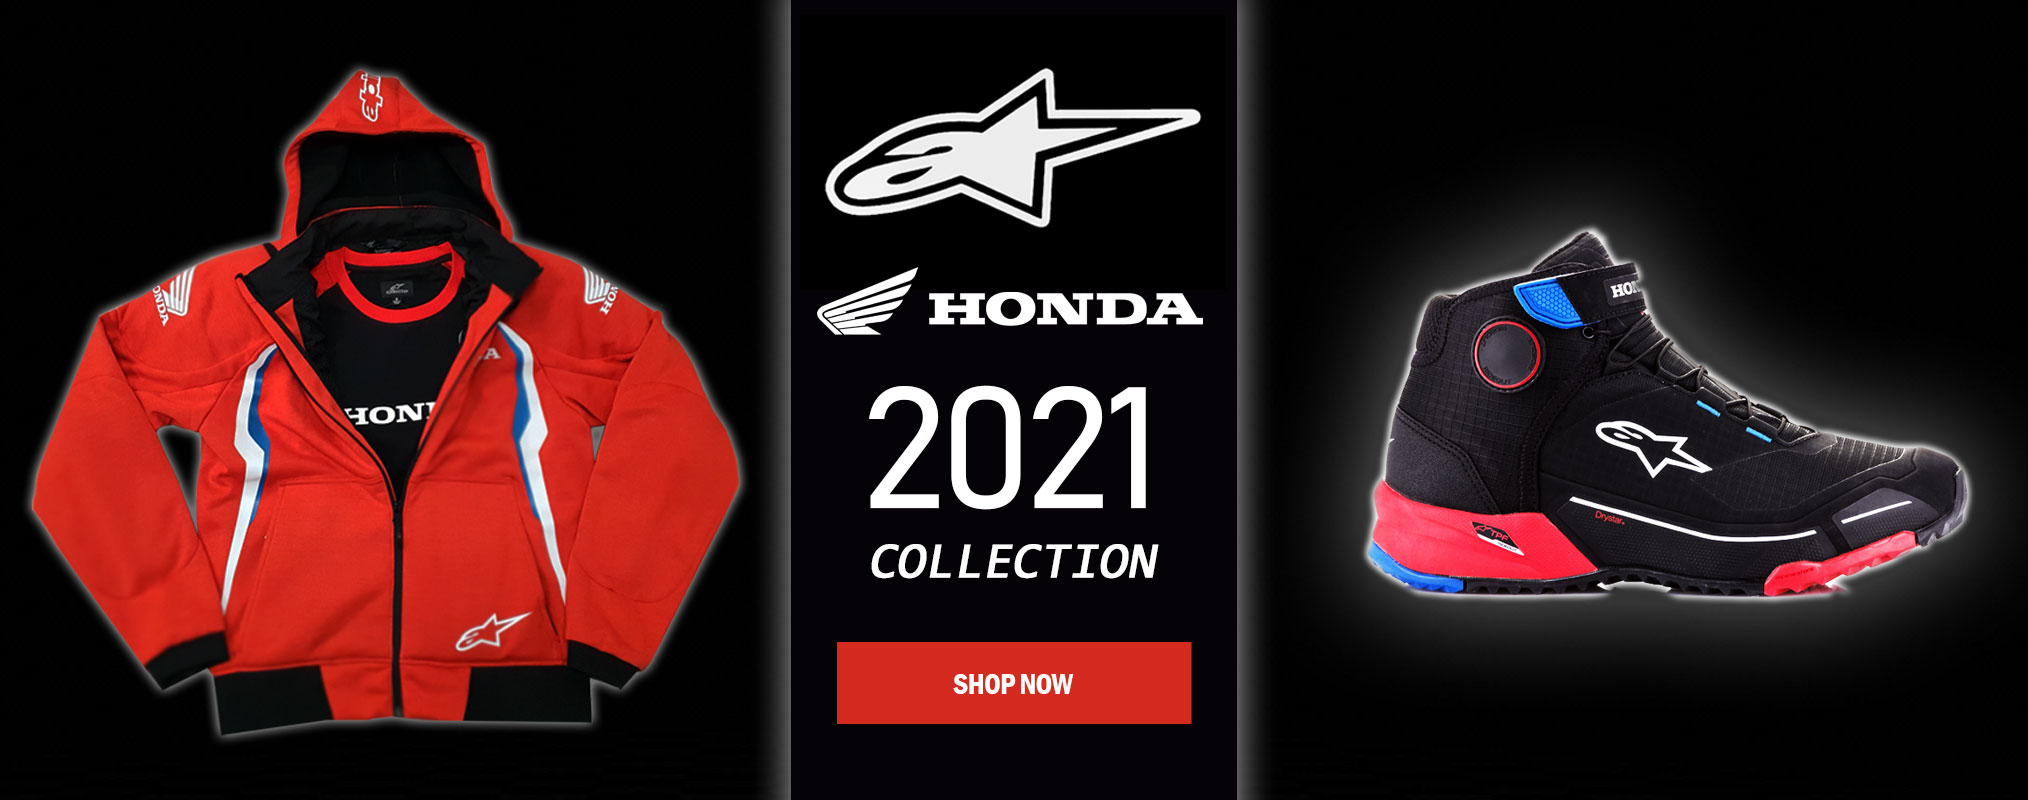 Alpinestars Honda collection